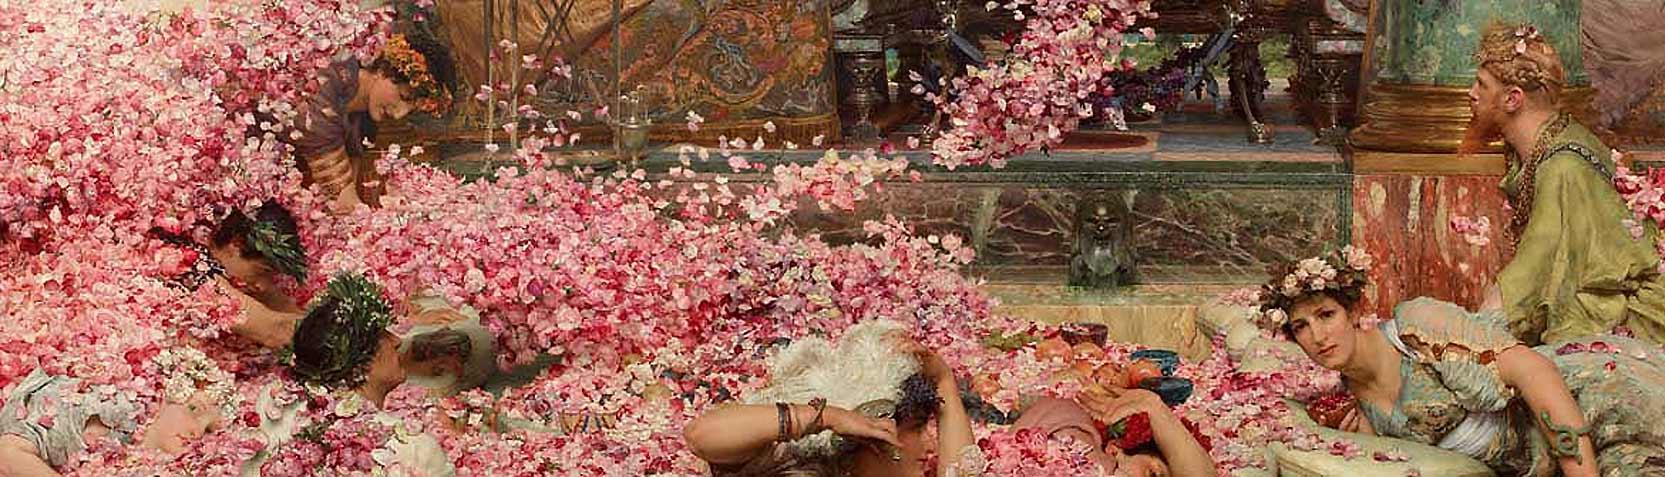 Künstler - Sir Lawrence Alma-Tadema